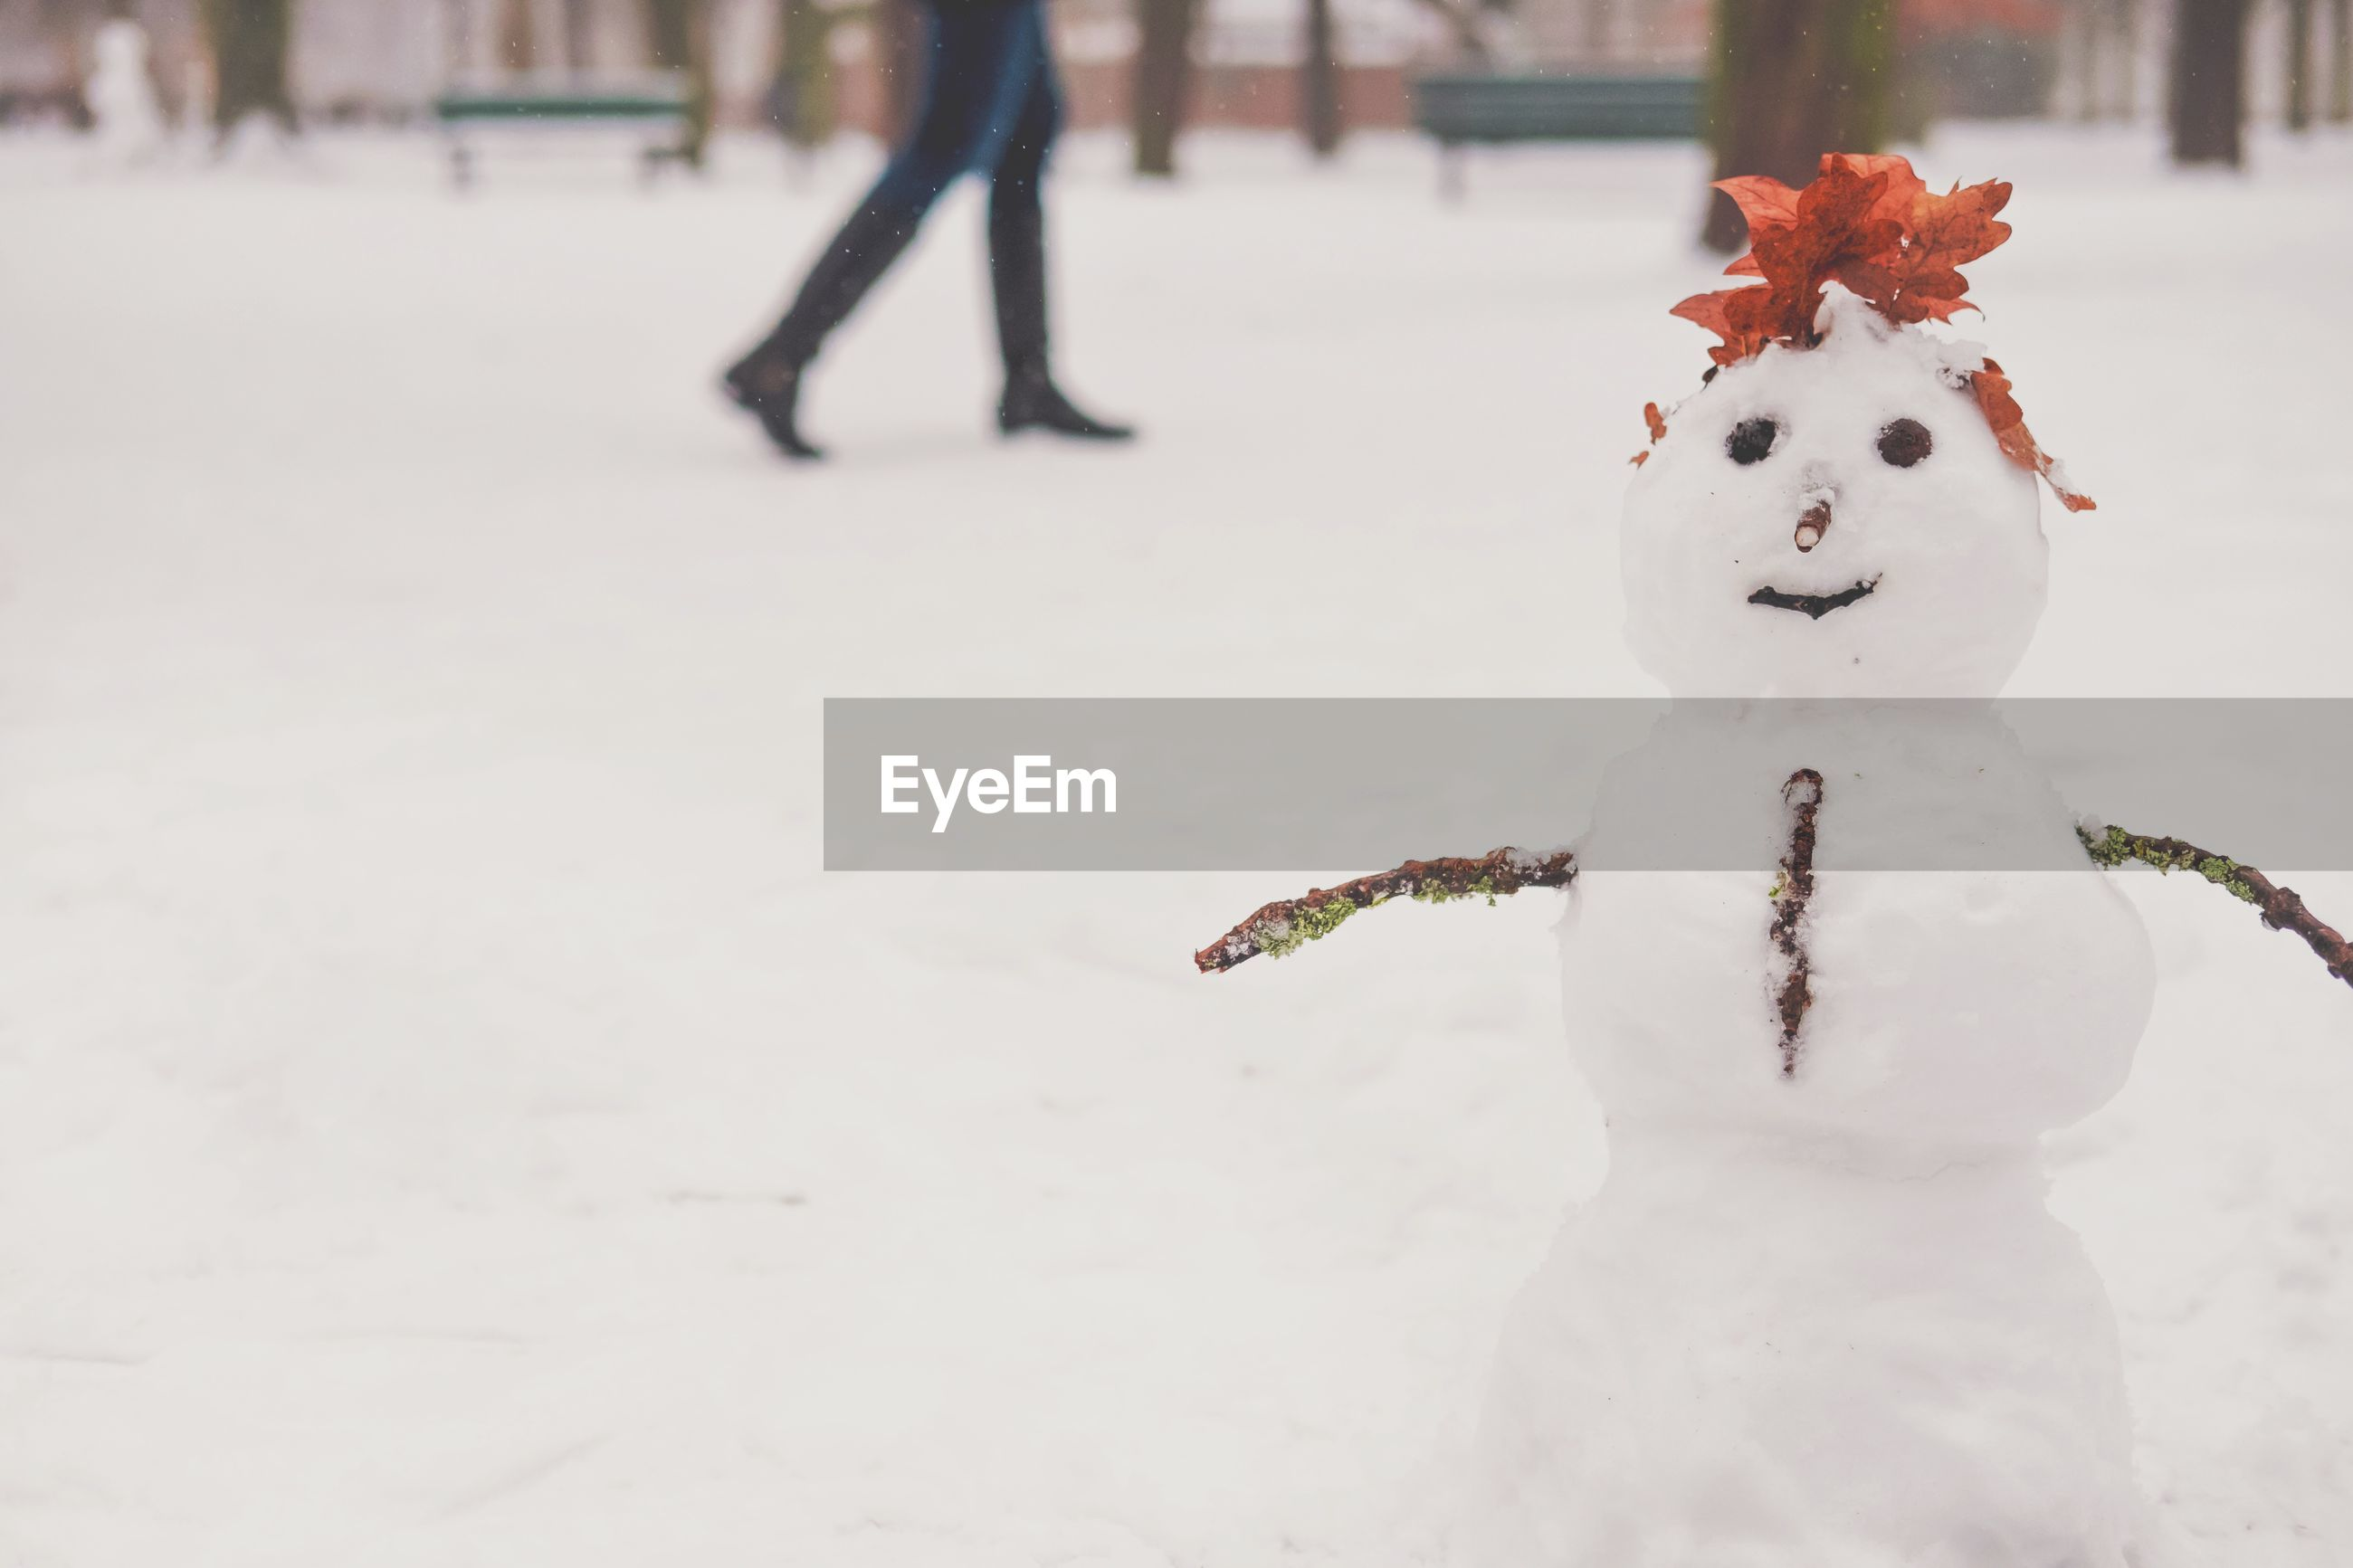 Snowman during winter